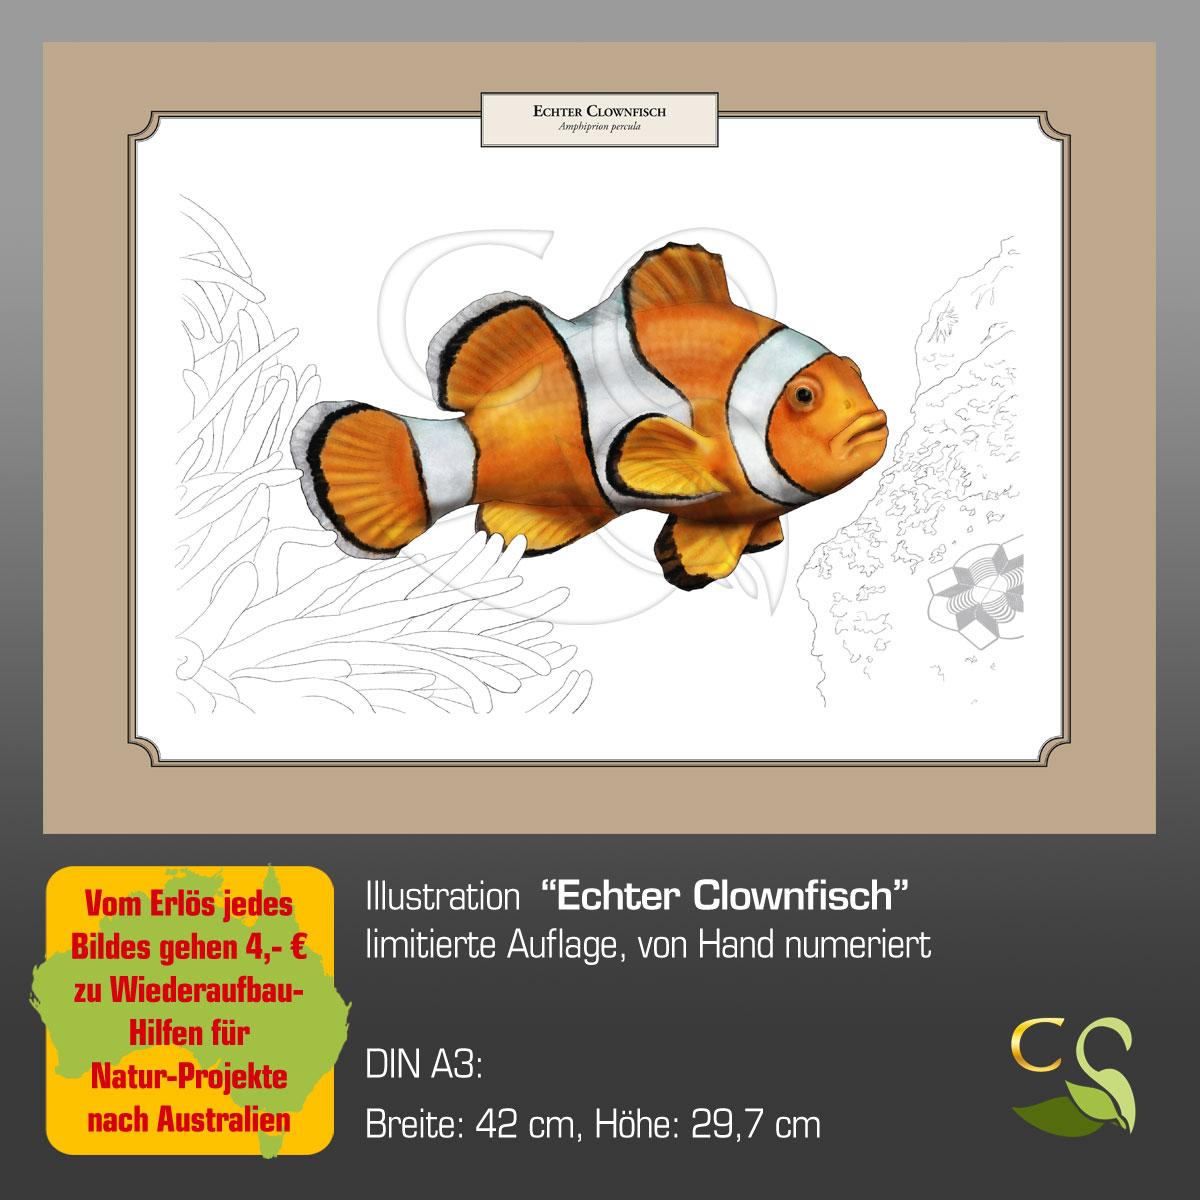 EchterClownfischA3fA